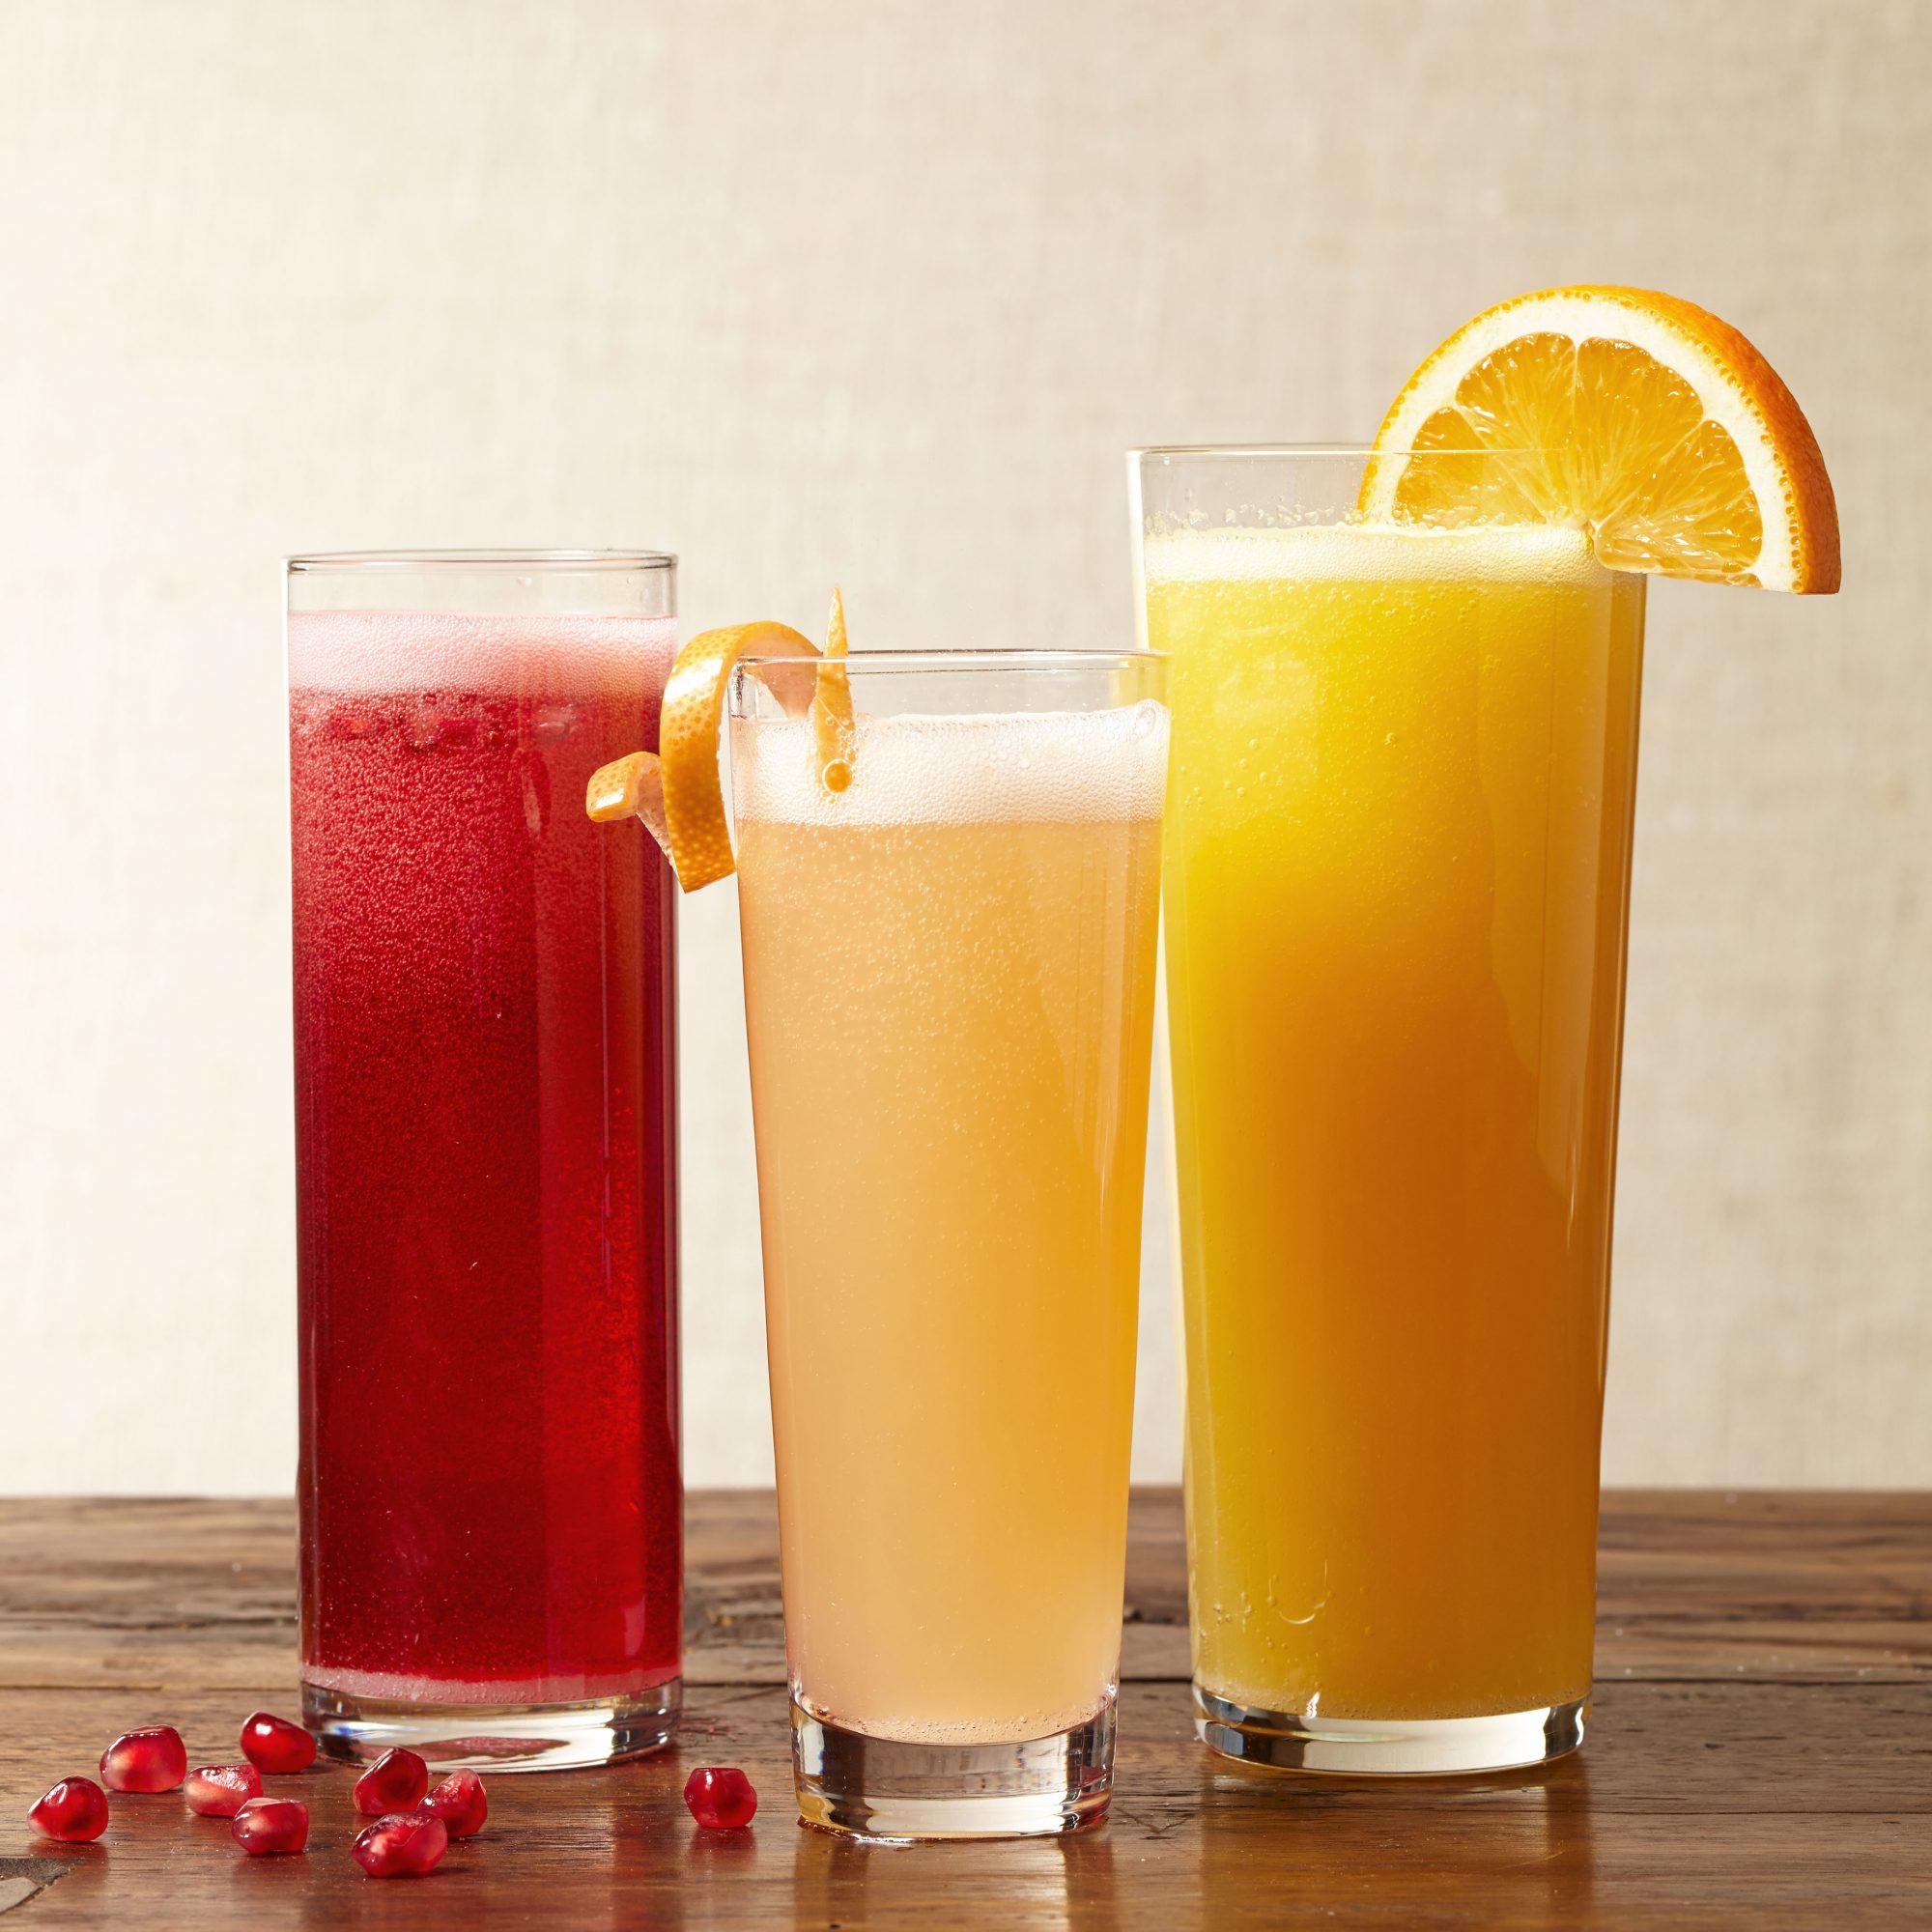 Grapefruit-Lemon Spritzer